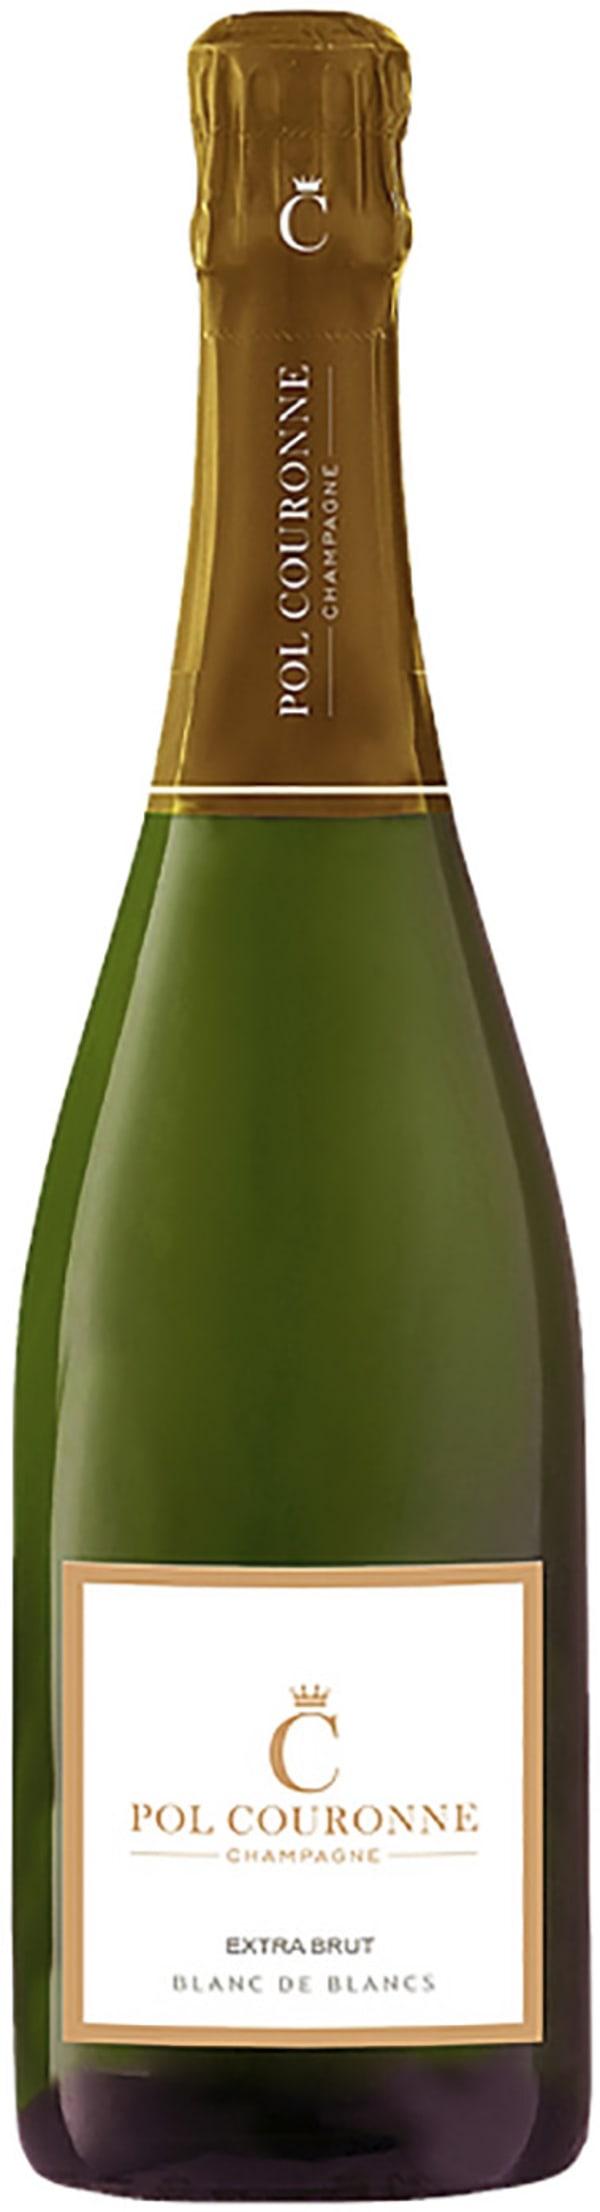 Pol Couronne Grand Cru Blanc de Blancs Champagne Extra Brut